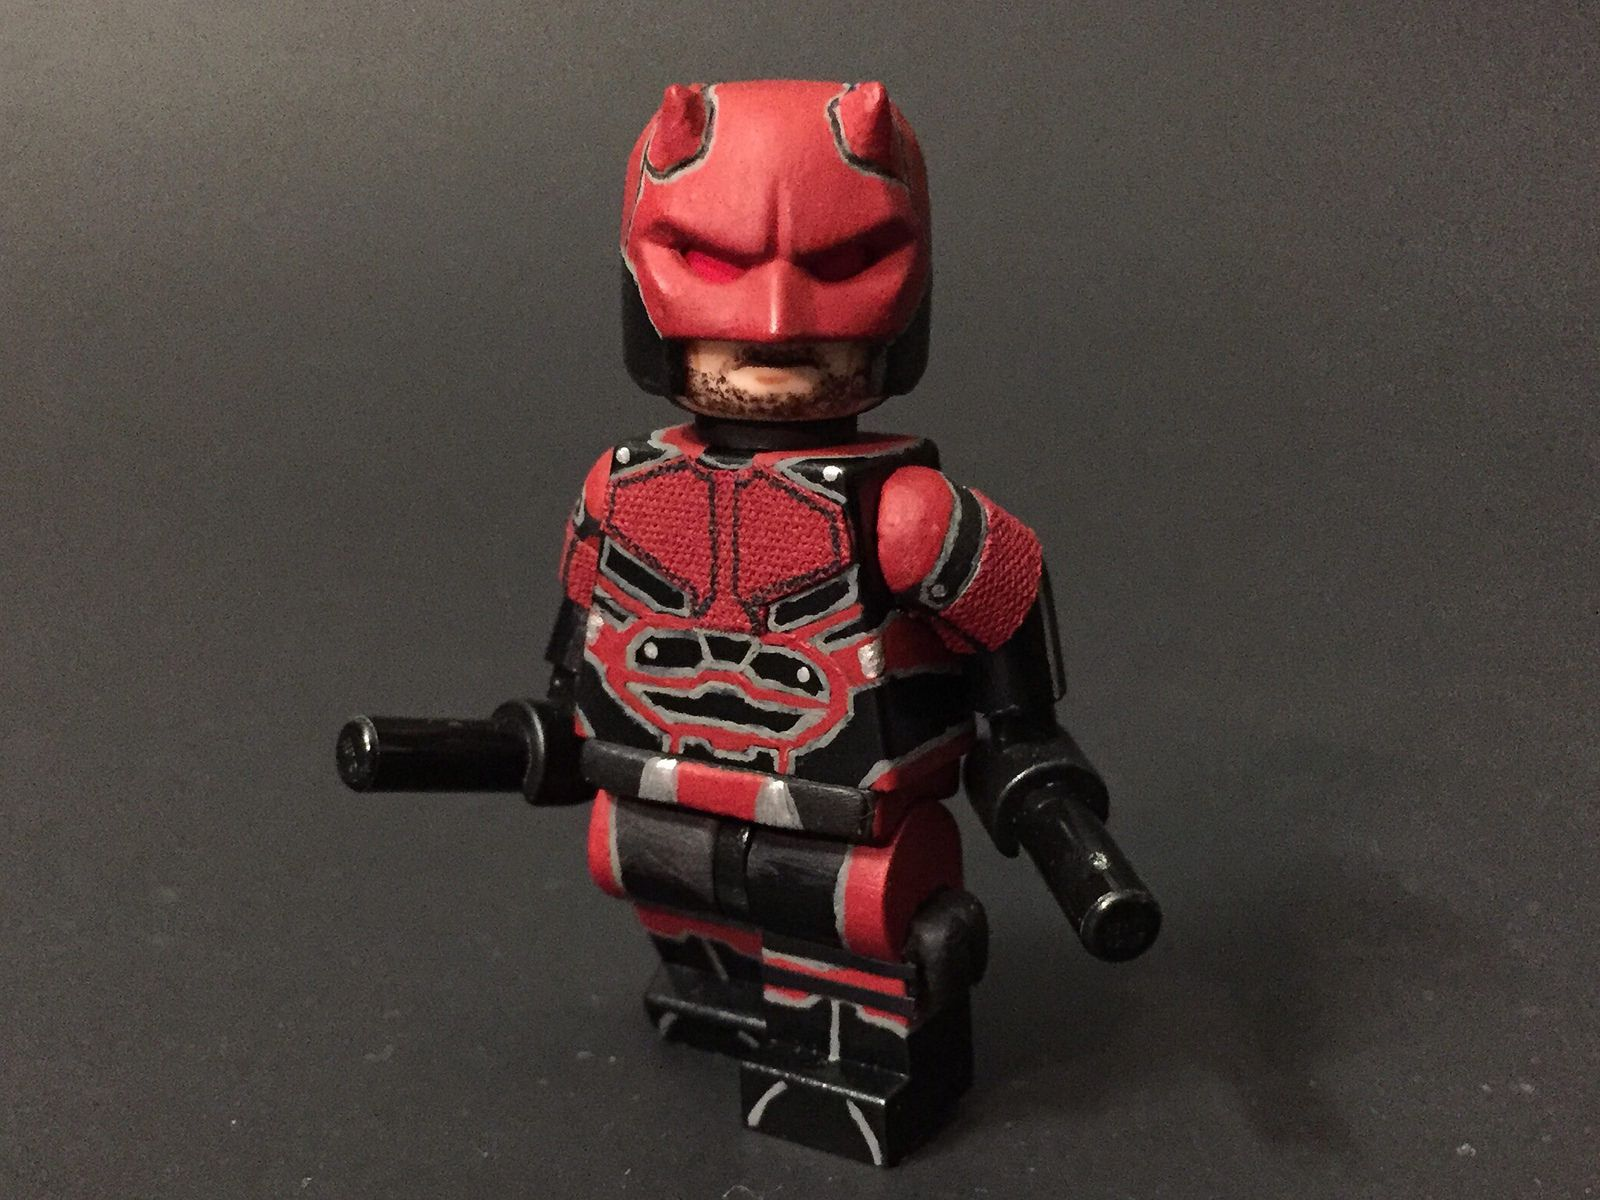 CUSTOM LEGO MINIFIGURE Daredevil from Marvel Comics